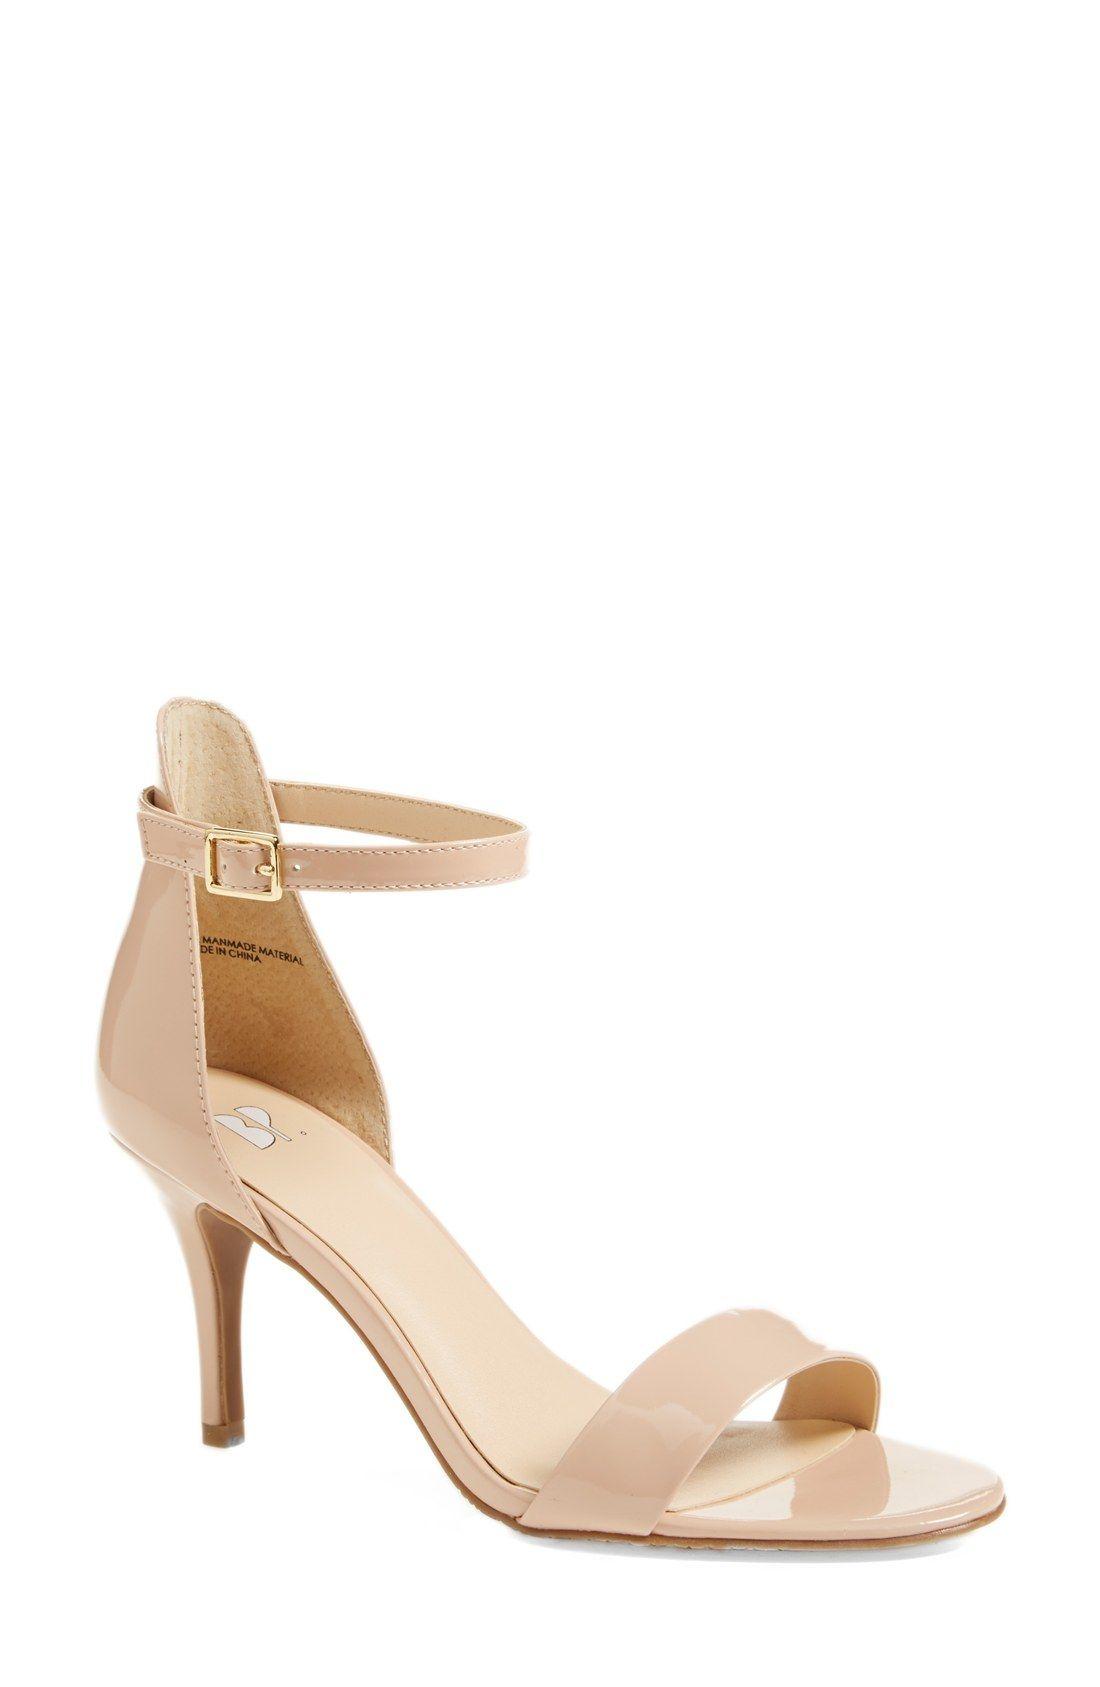 Luminate' Open Toe Dress Sandal | Open toe sandals, Open toe and ...